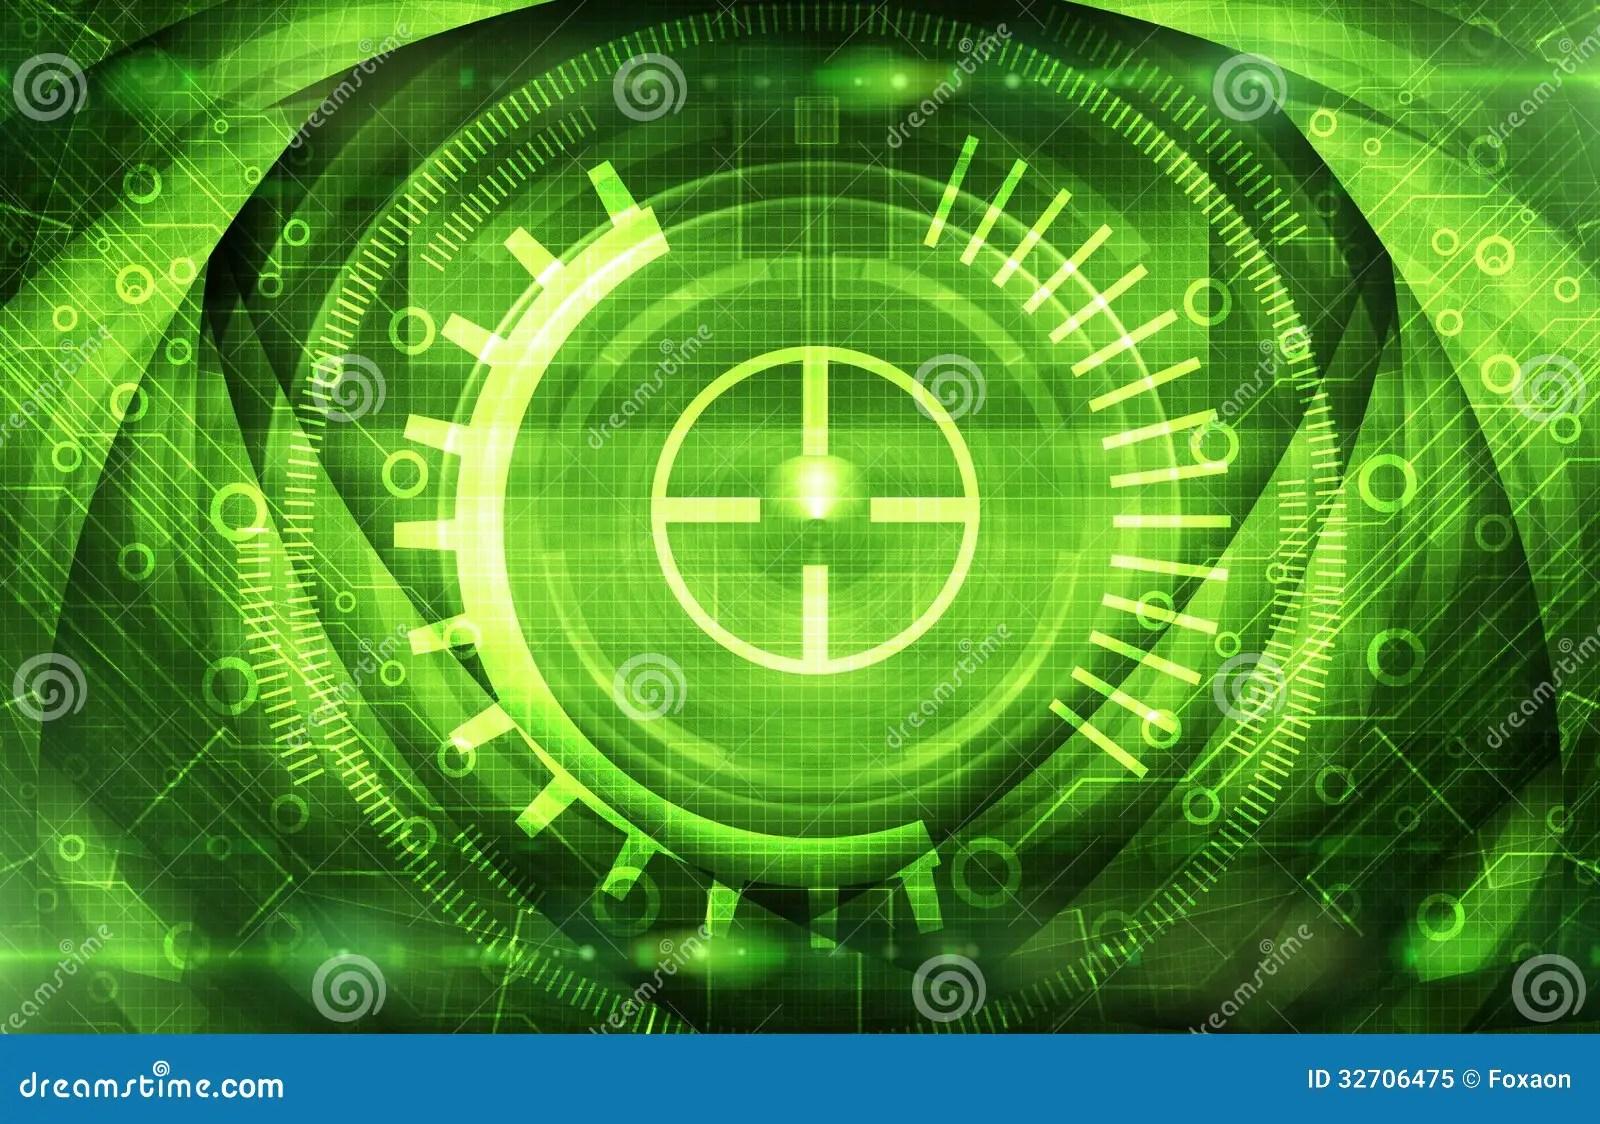 Modern 3d Wallpaper Texture Abstract Dark Green Technical Background Royalty Free